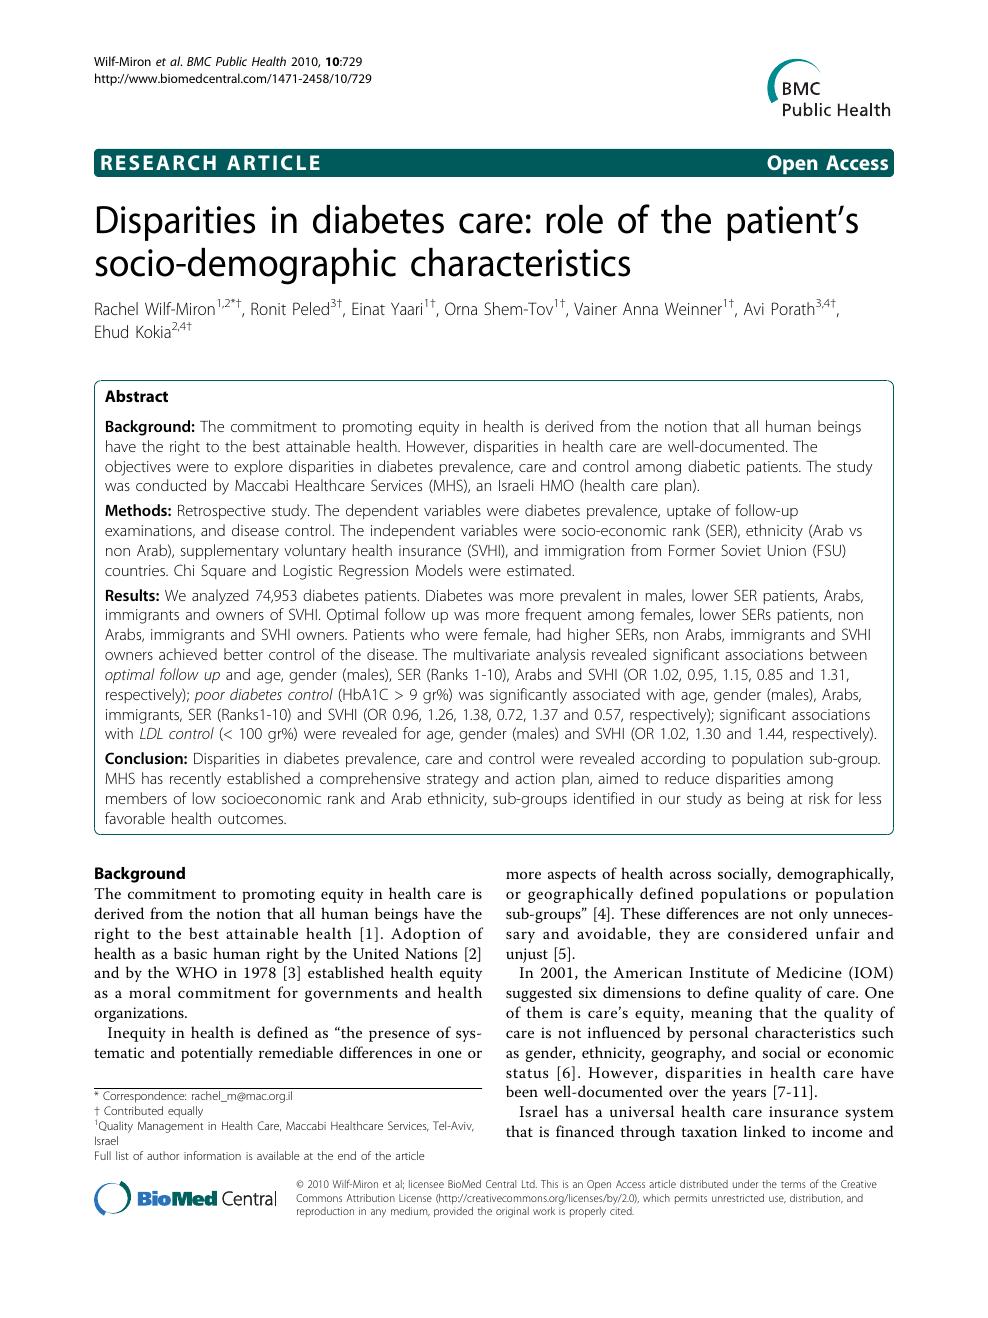 Disparities in diabetes care: role of the patient's socio